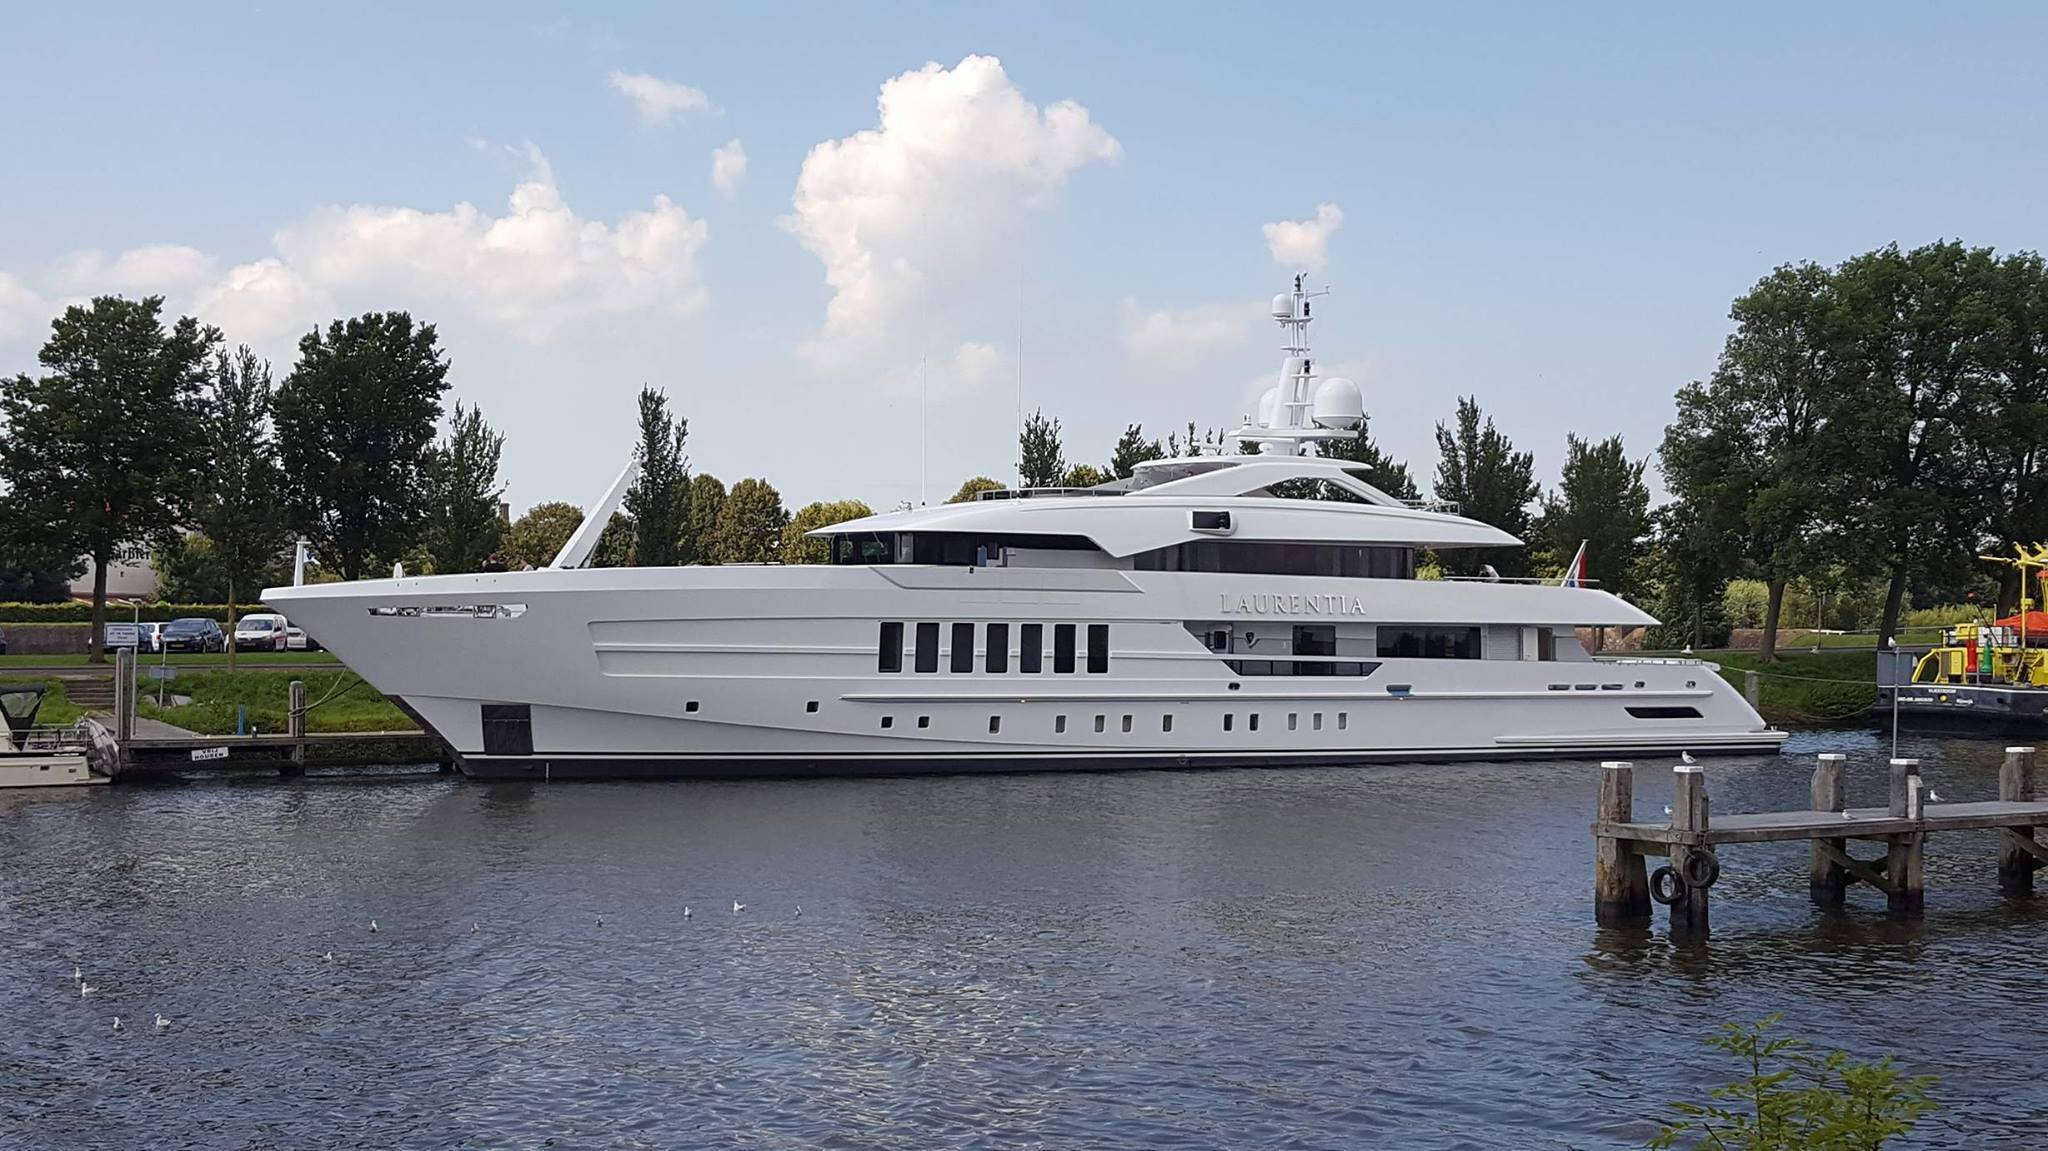 Superyacht LAURENTIA - Currently undergoing sea trials in Hellevoetsluis. Photo credit - Andre Dorst at Dutch Yachting